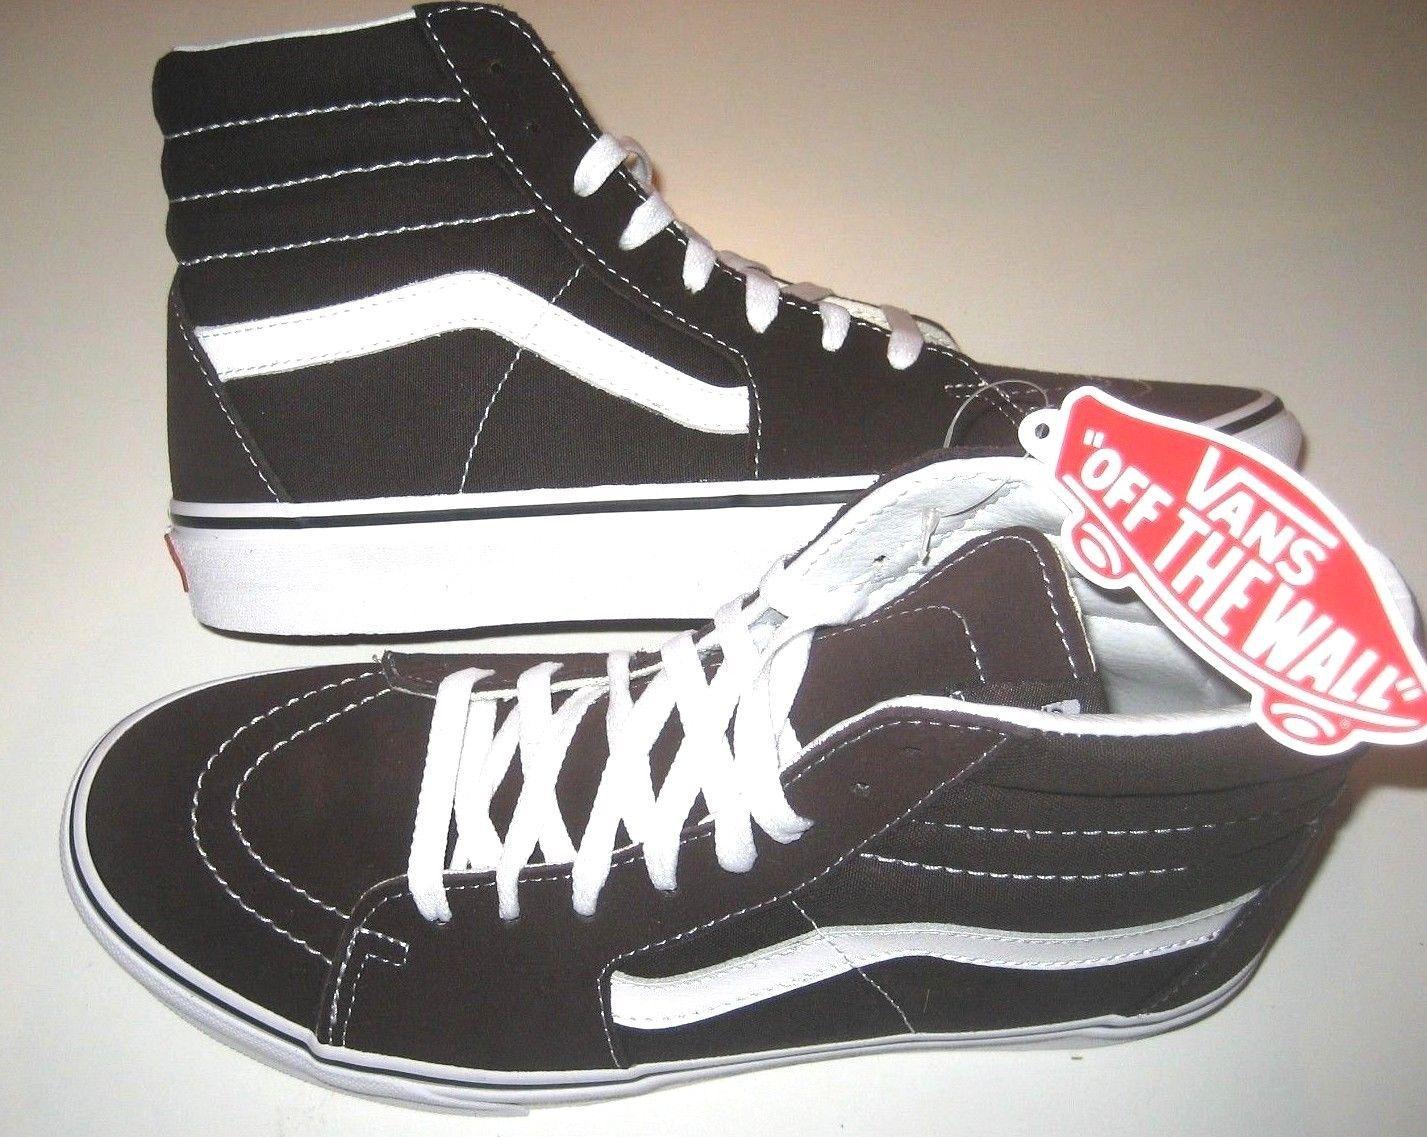 Vans Mens Sk8-Hi Chocolate Torte True White Canvas Suede Skate shoes Size 9 NWT image 2